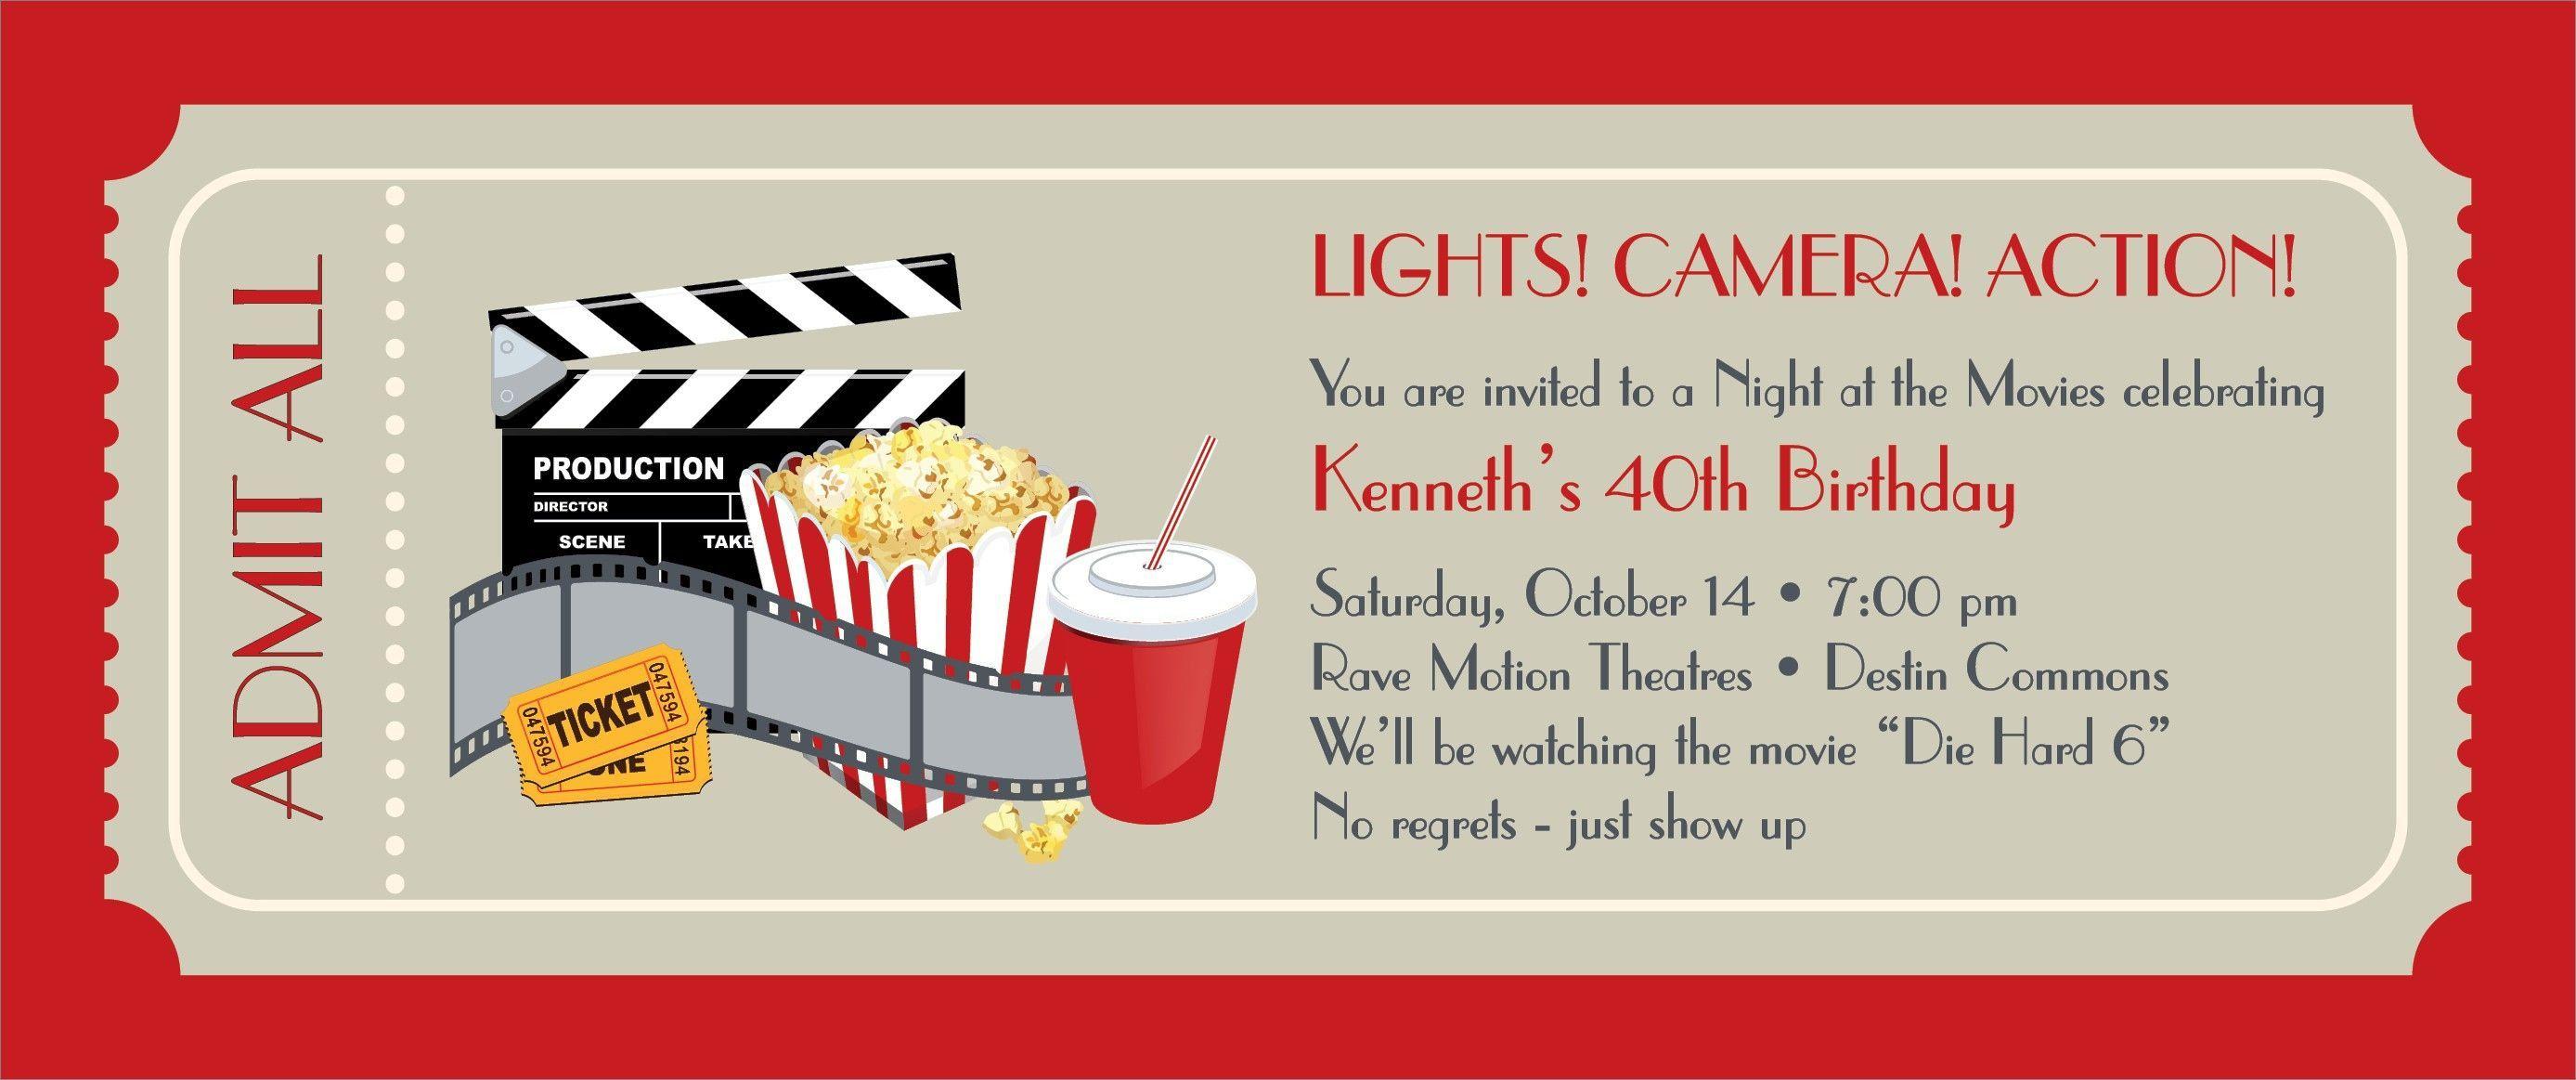 005 Frightening Movie Ticket Invitation Template Inspiration  Blank Free Download Editable PrintableFull